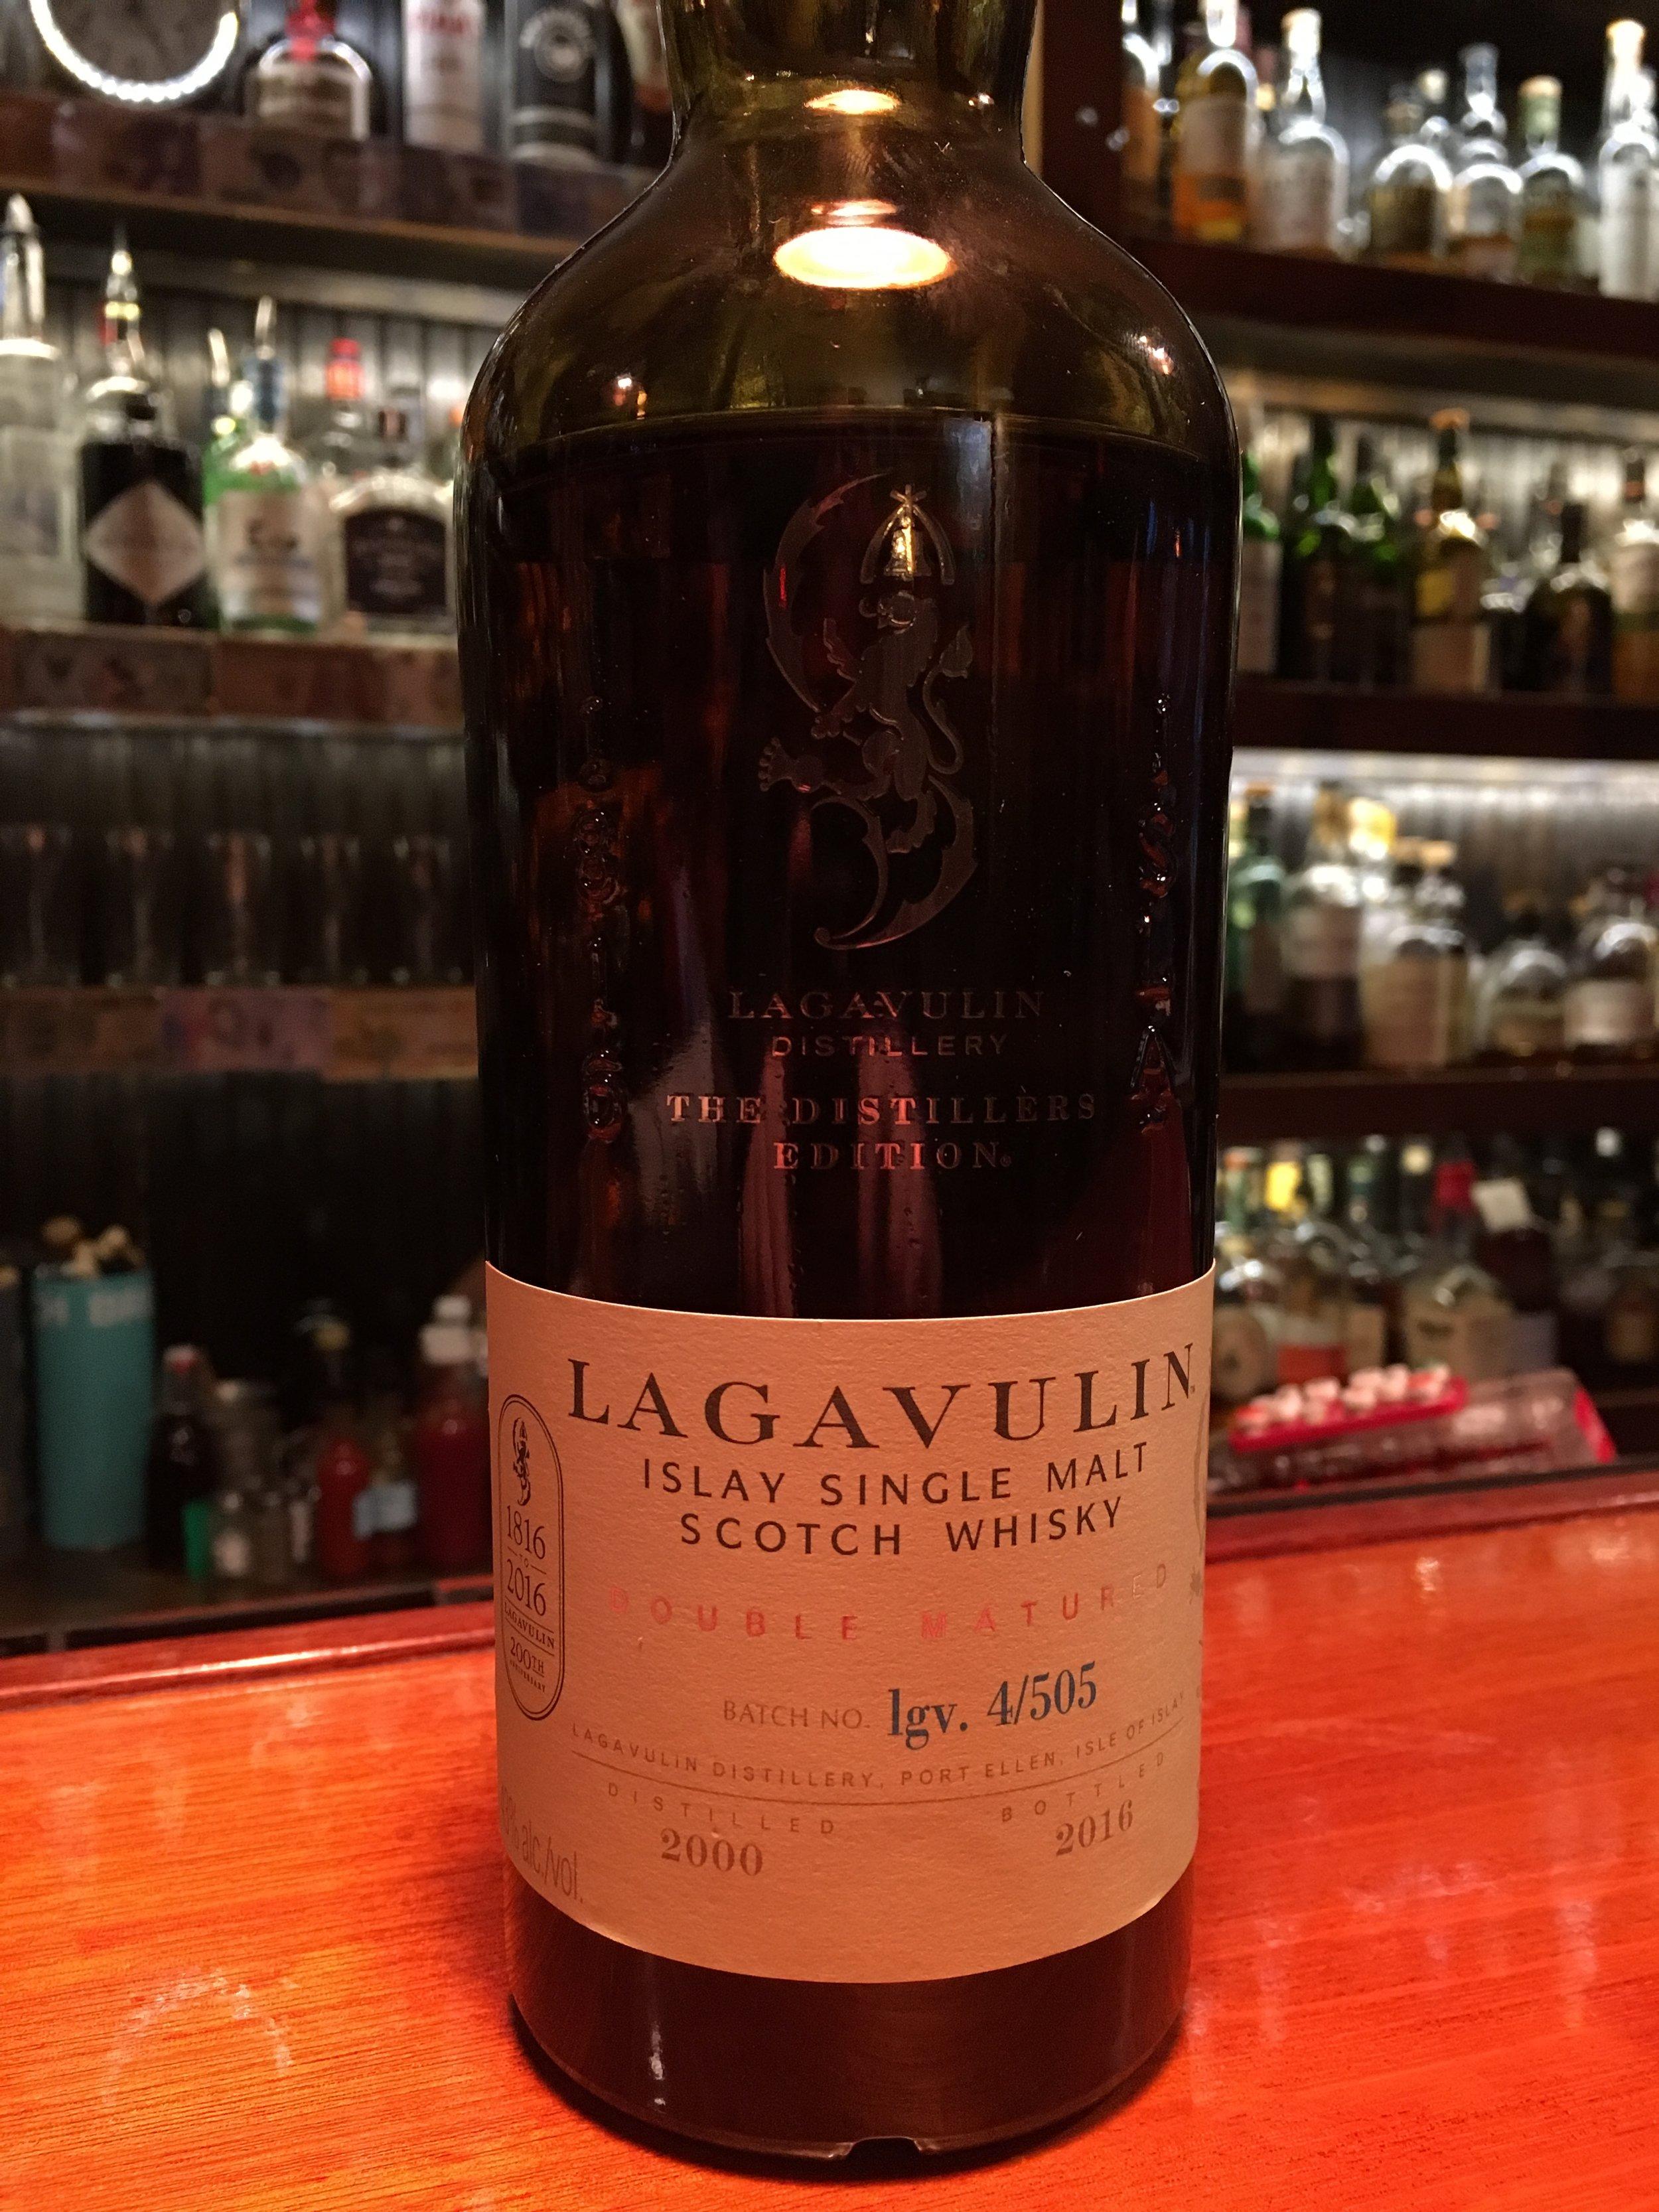 16 Year Old   43% ABV - Distillery   Lagavulin